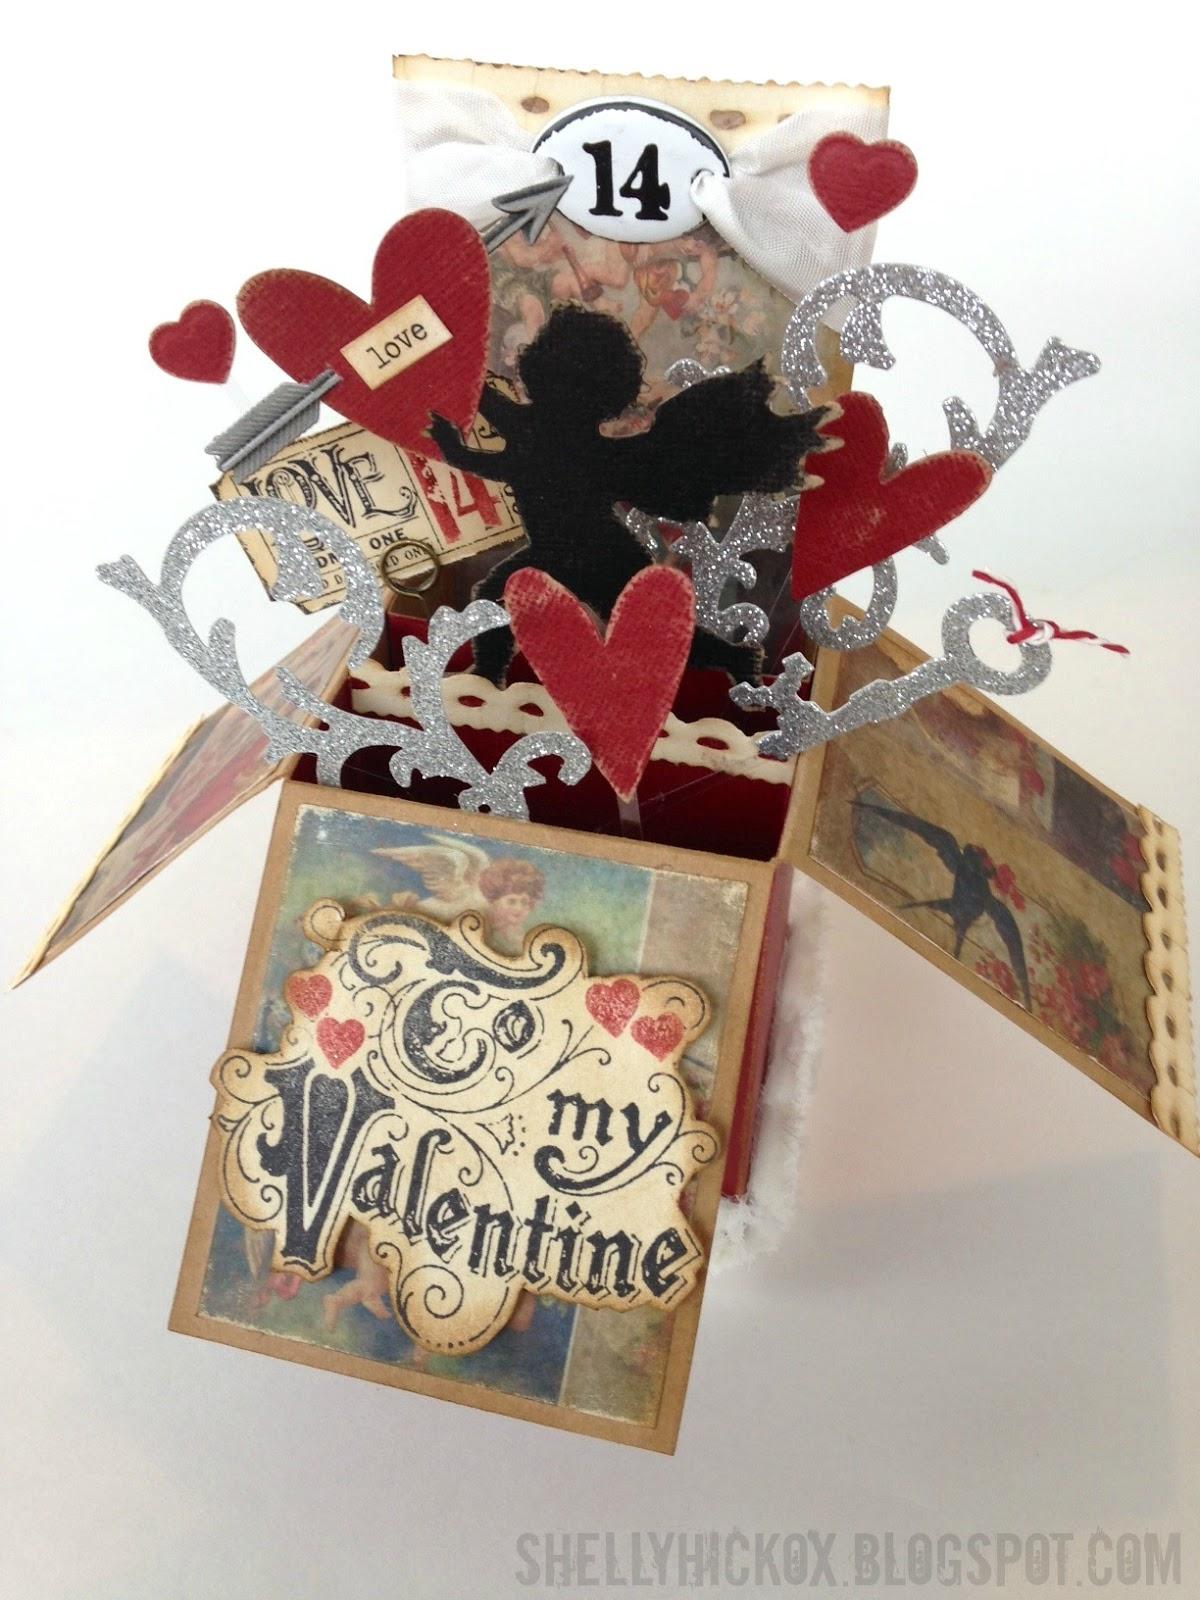 stamptramp to my valentine  popup box card